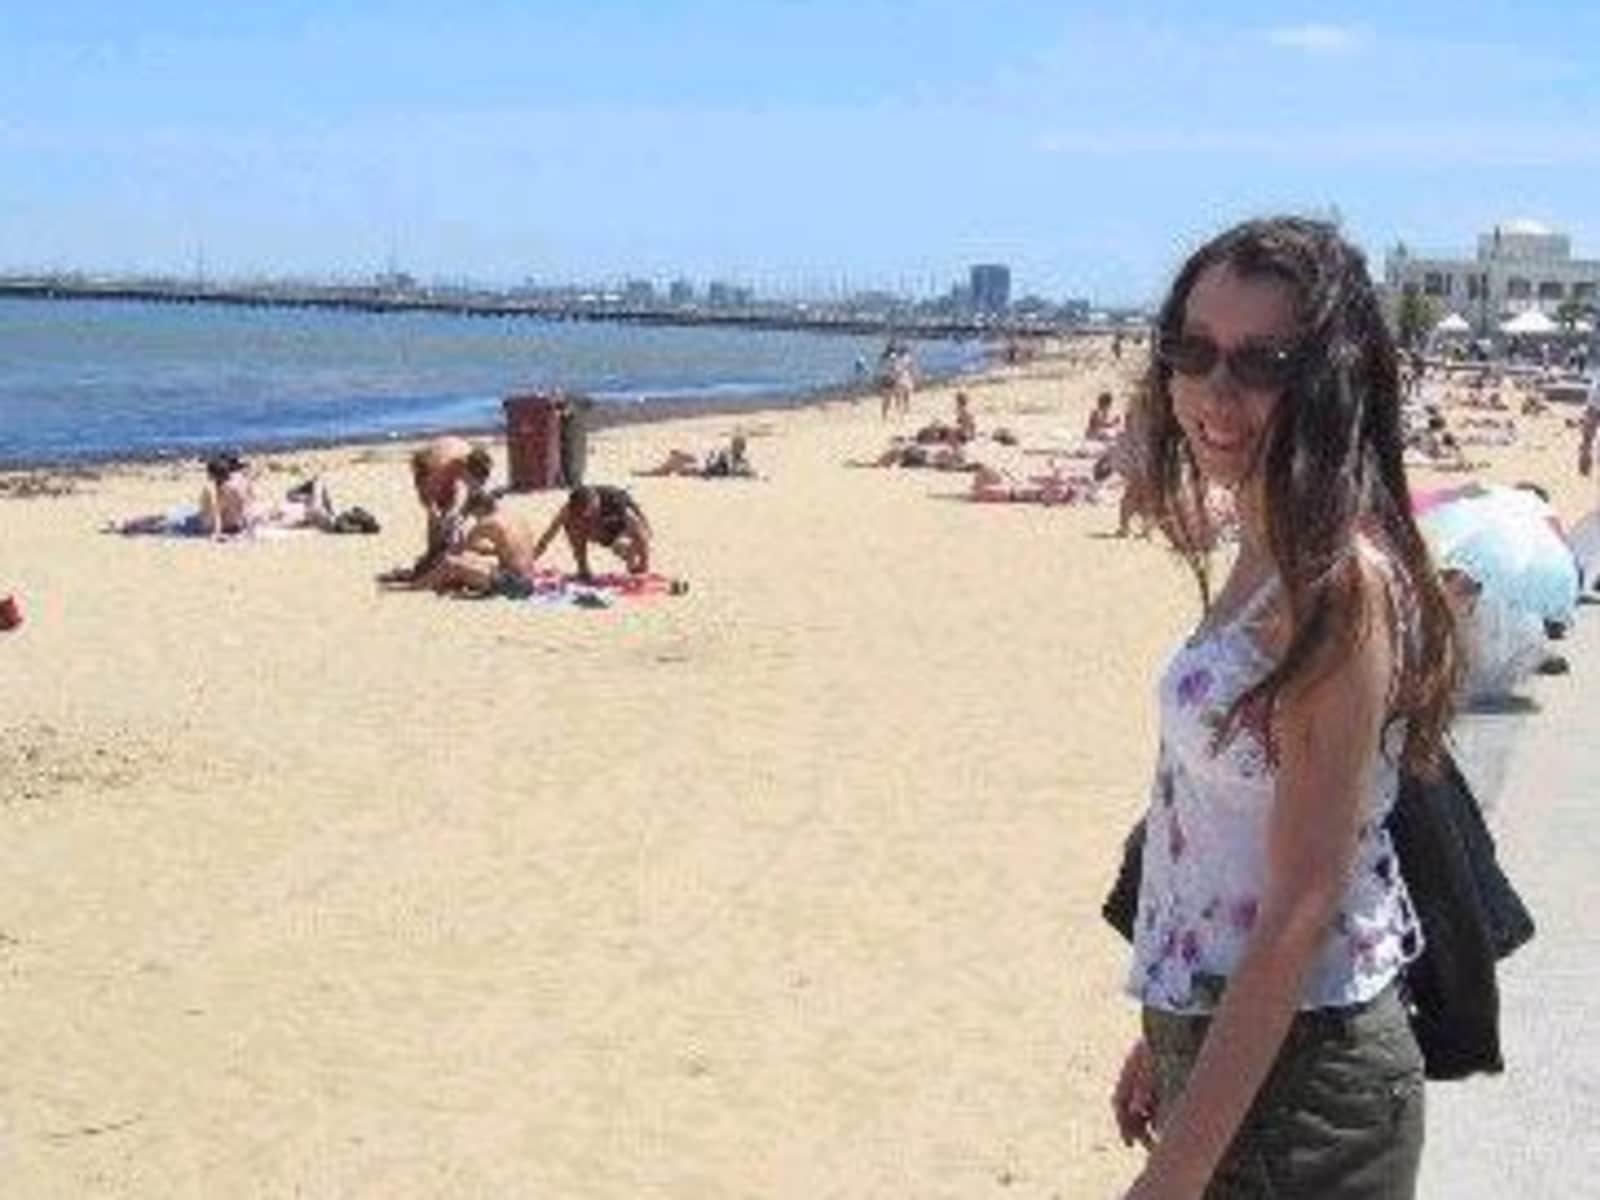 Taryn from Winnipeg, Manitoba, Canada